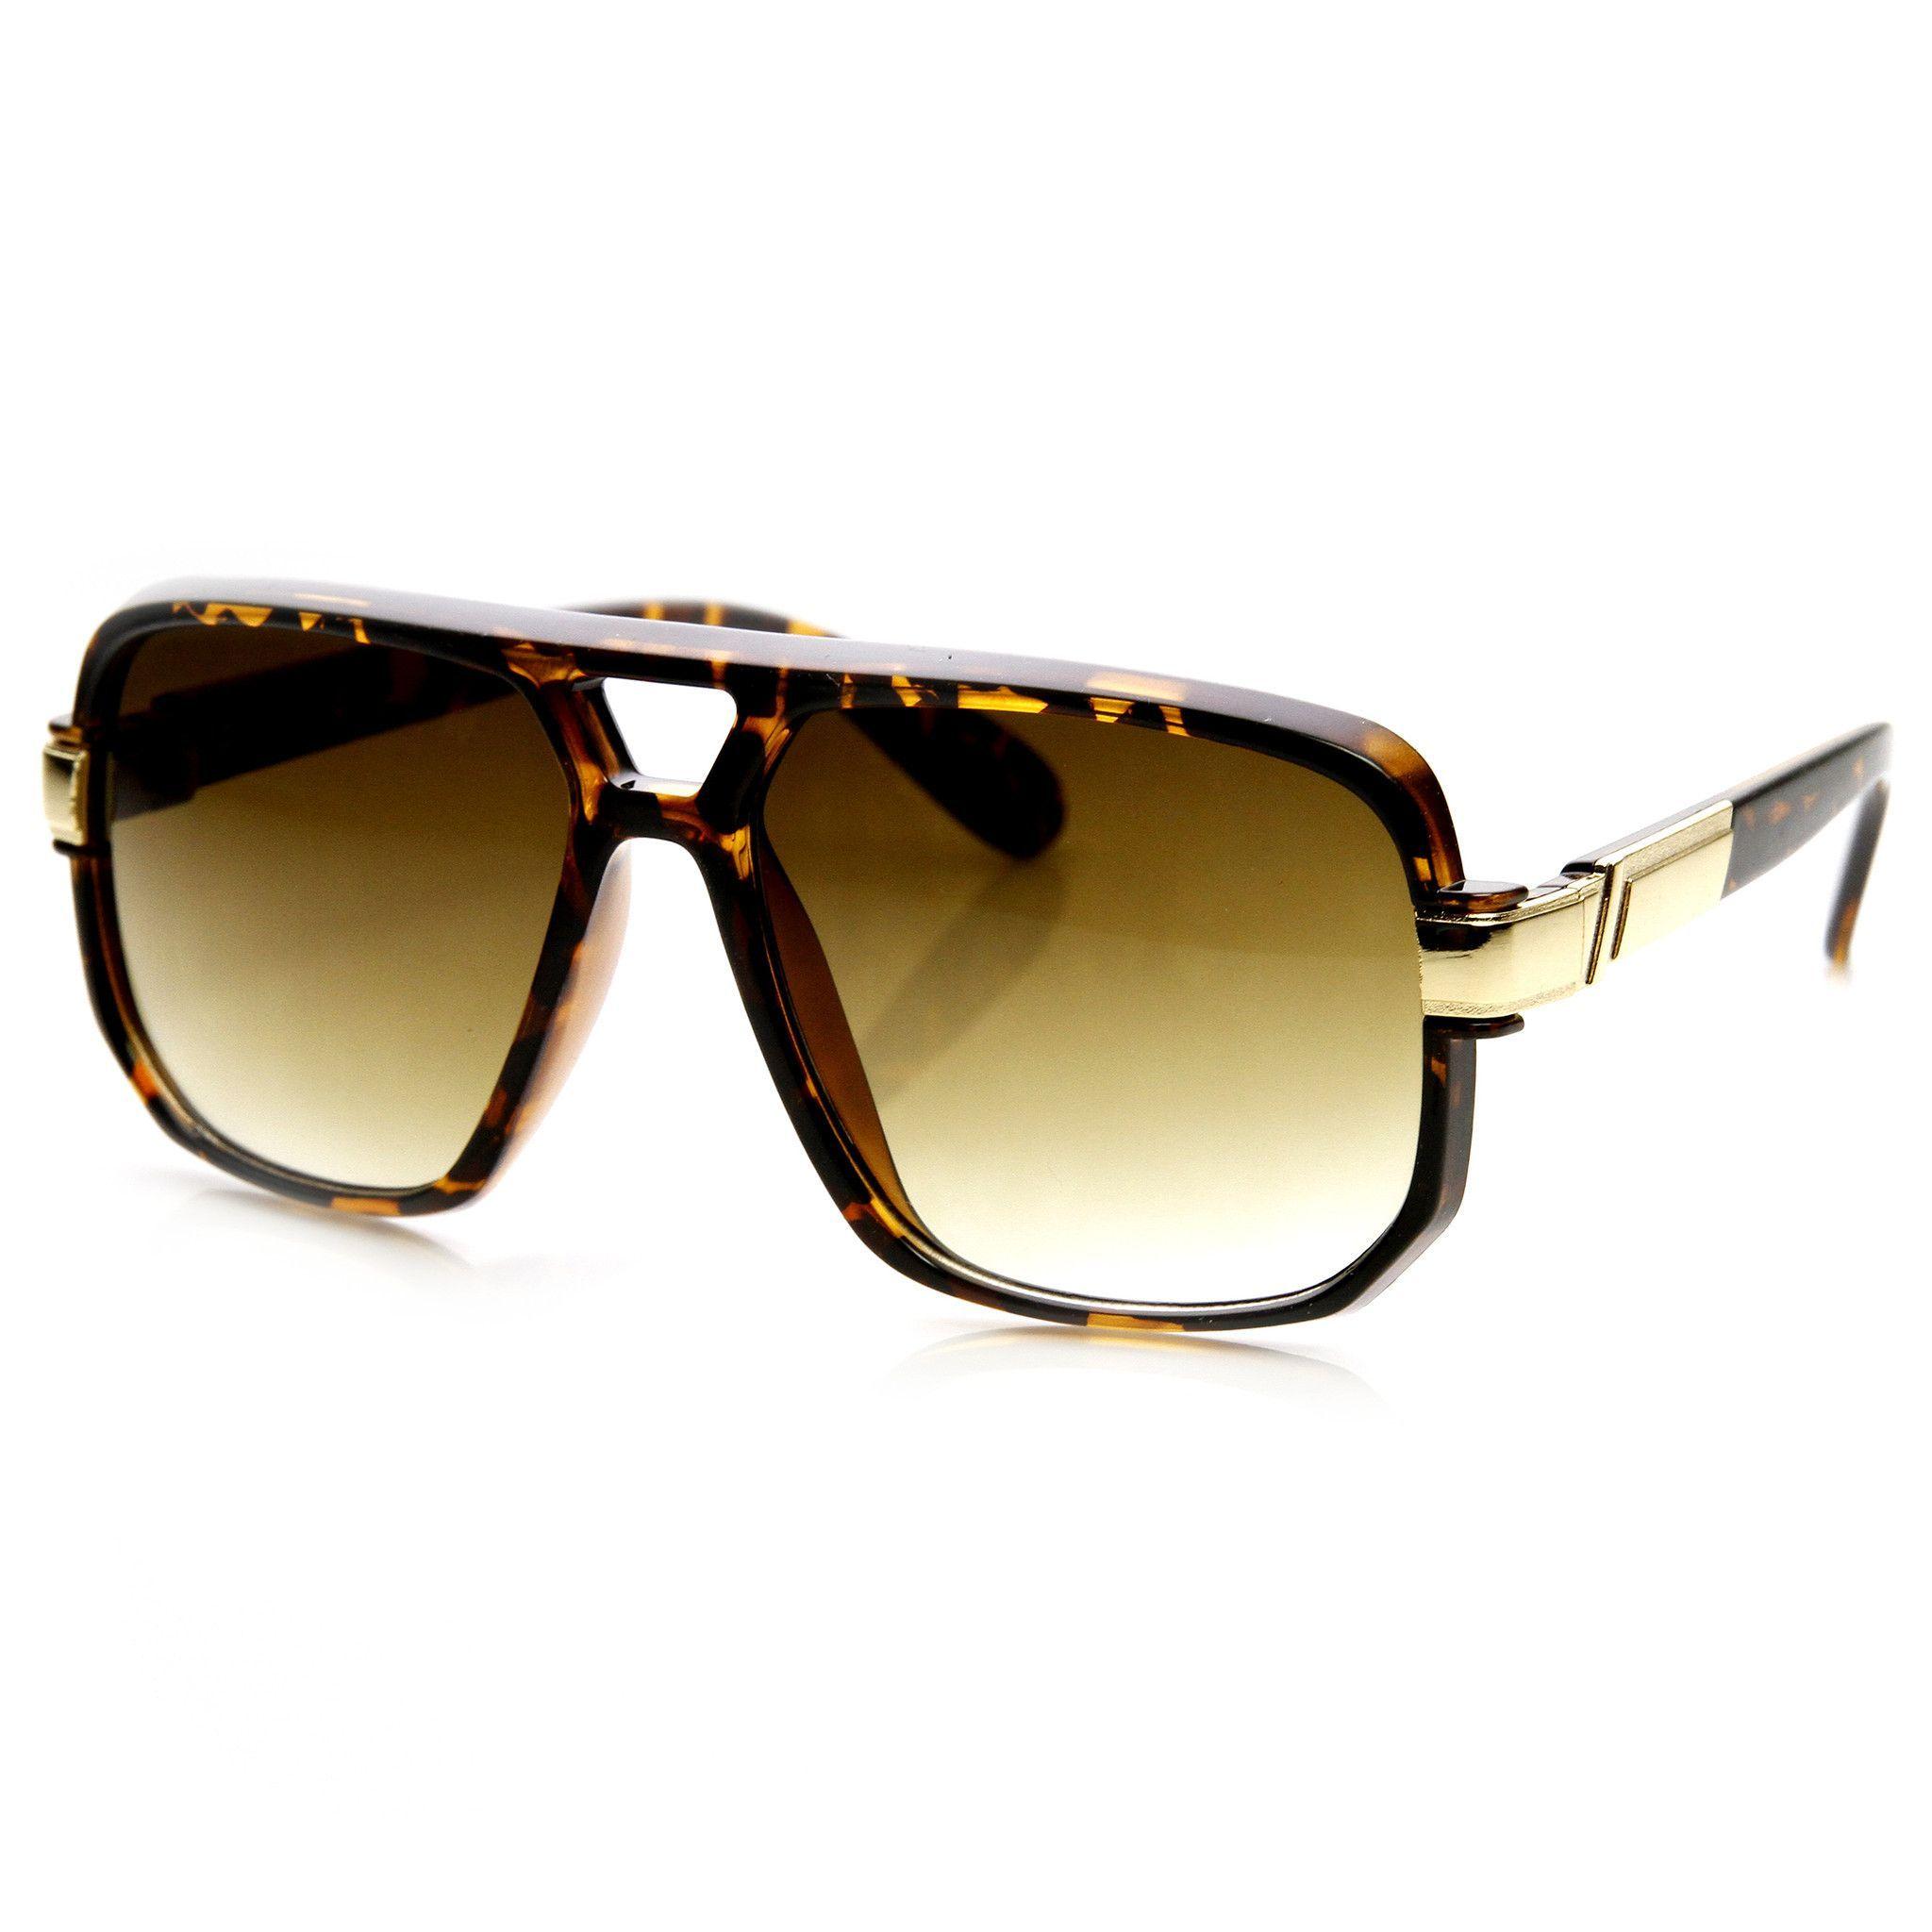 Retro 1980 S Fashion Disco Square Aviator Sunglasses 9260 Top Aviator Sunglasses Aviator Sunglasses Glasses Fashion